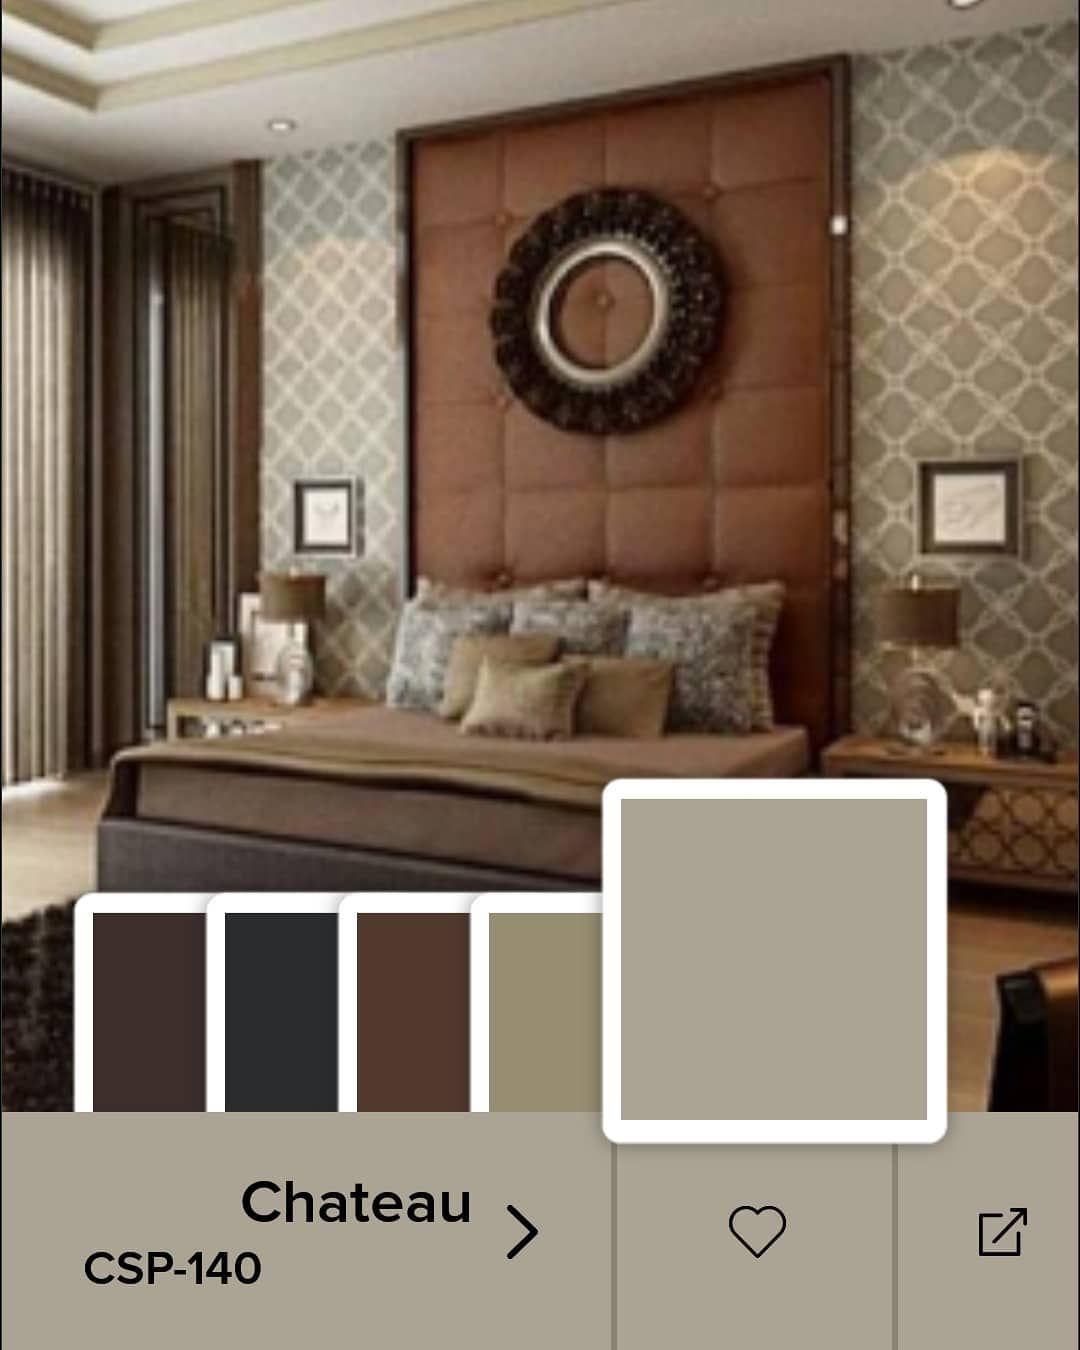 New The 10 Best Home Decor With Pictures للاستفادة من درجات الألوان متابعي الأفضل الصوره فيها كذا لون وبالتالي انا ارى انه يتم است Home Home Decor Decor